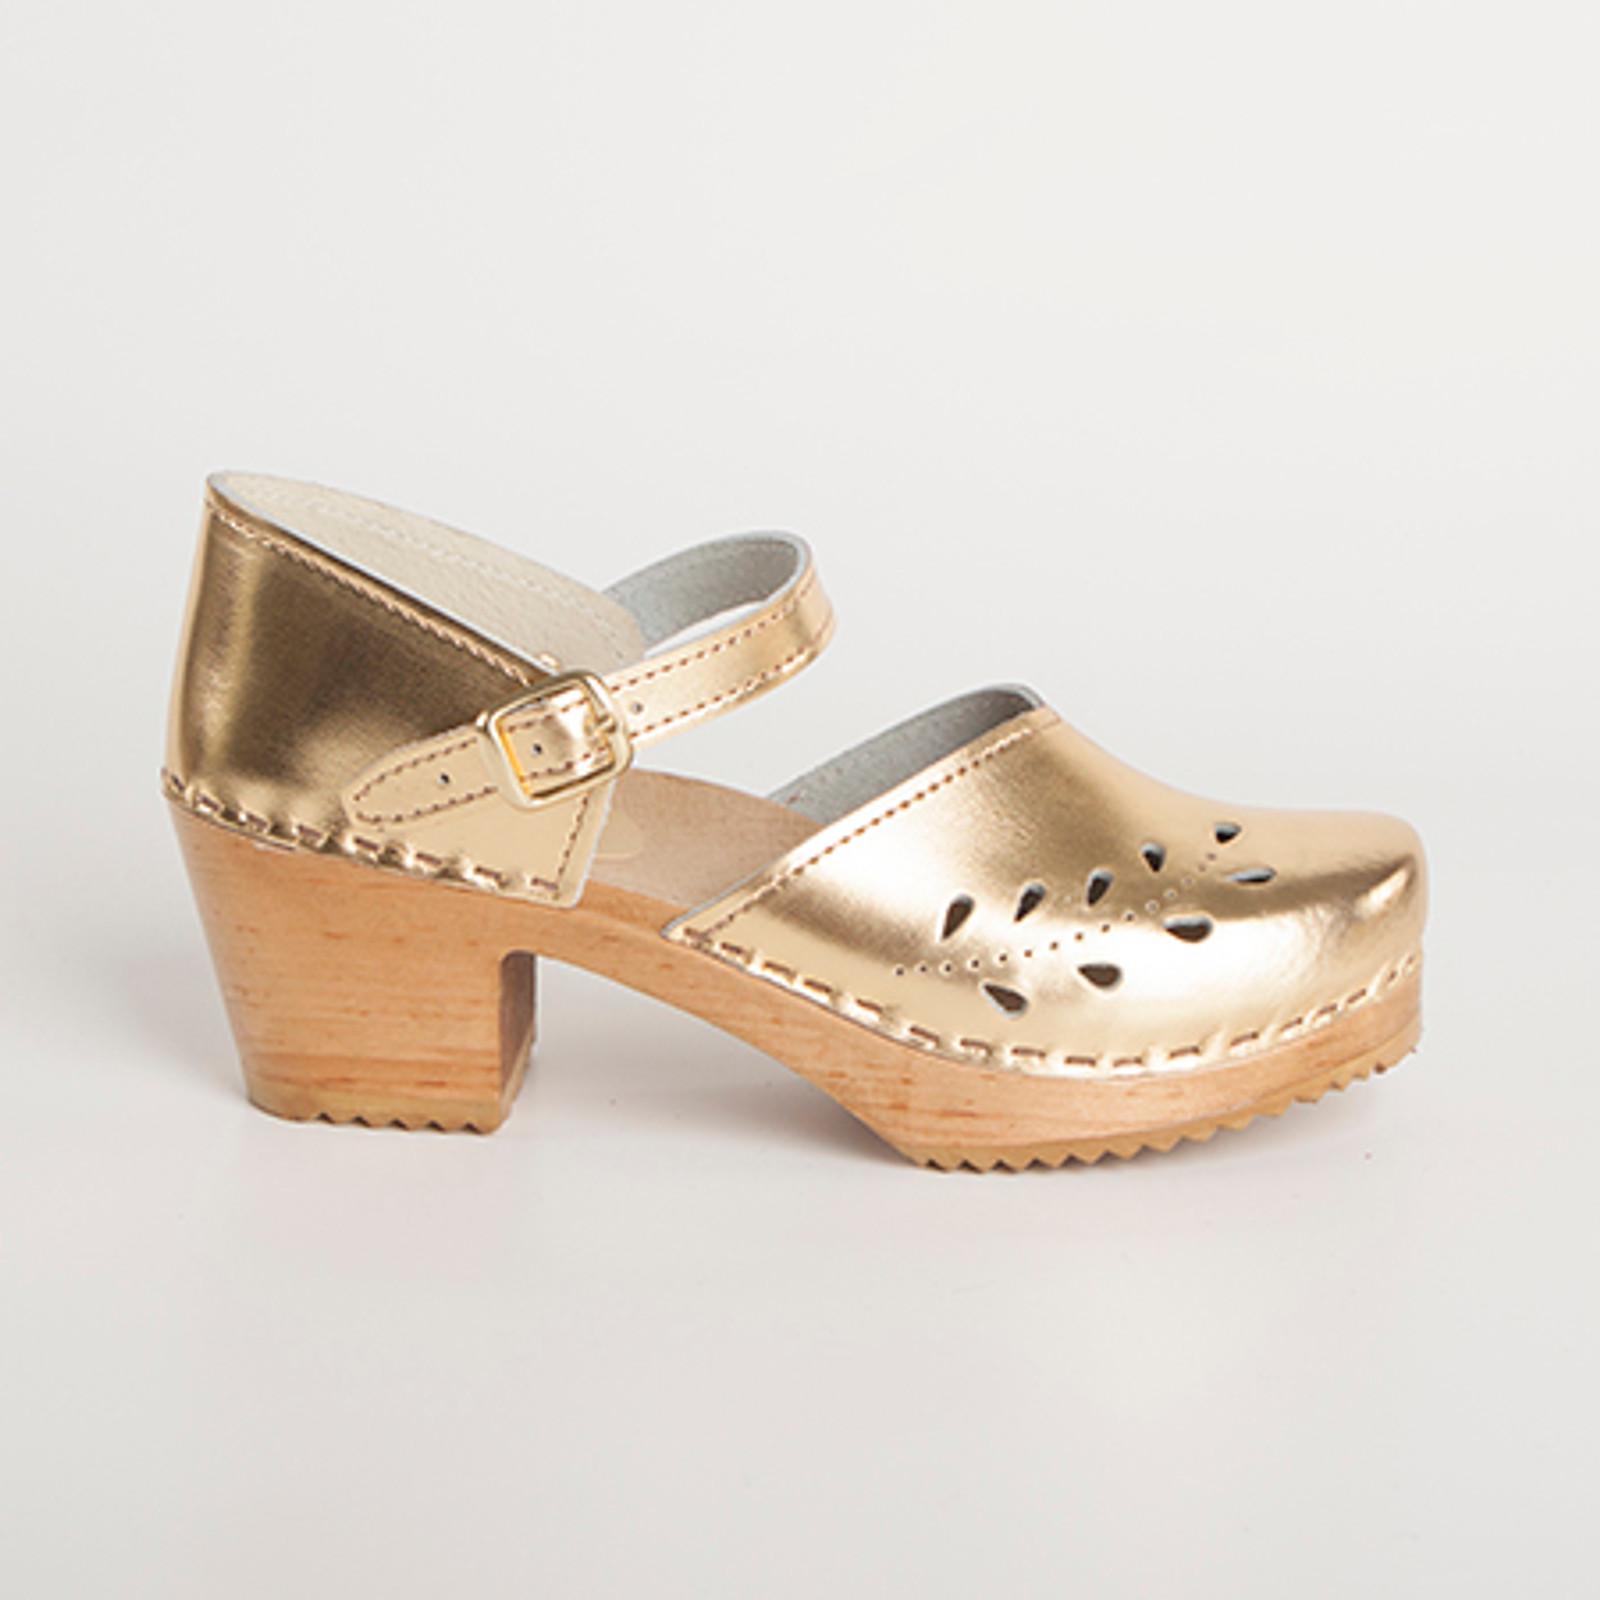 Closed Heel Sandal Clogs - Leaf Punch - Swedish